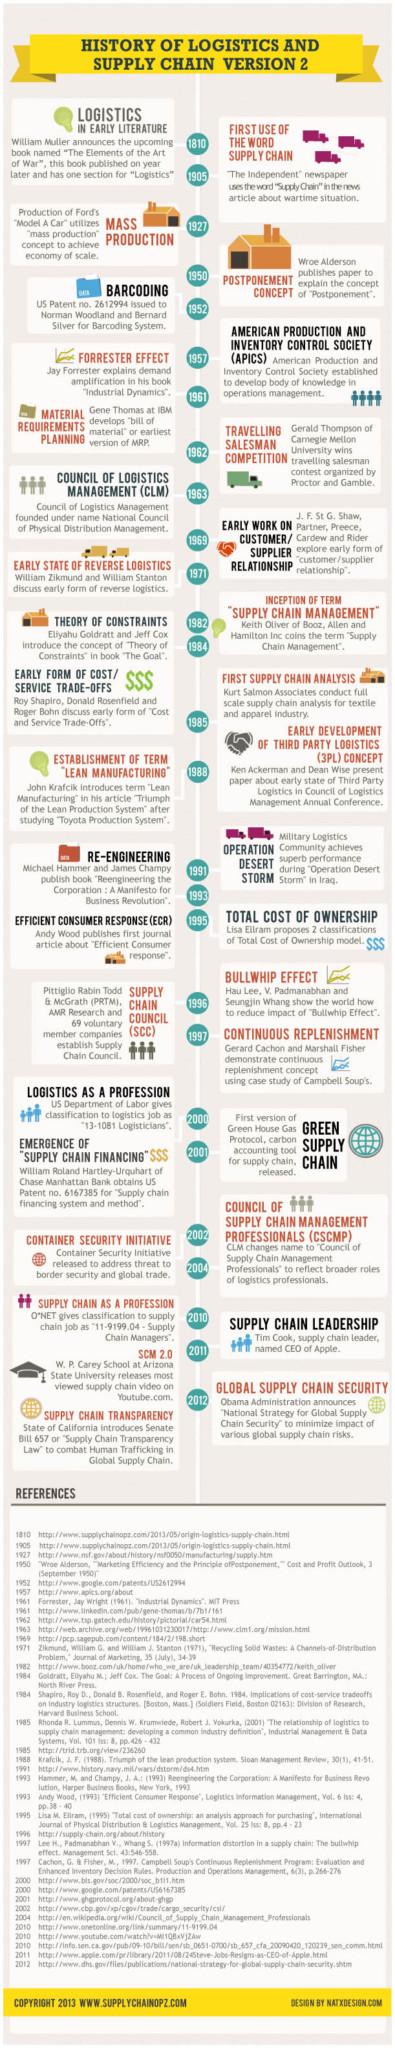 Supply Chain Logistics Management Infographic